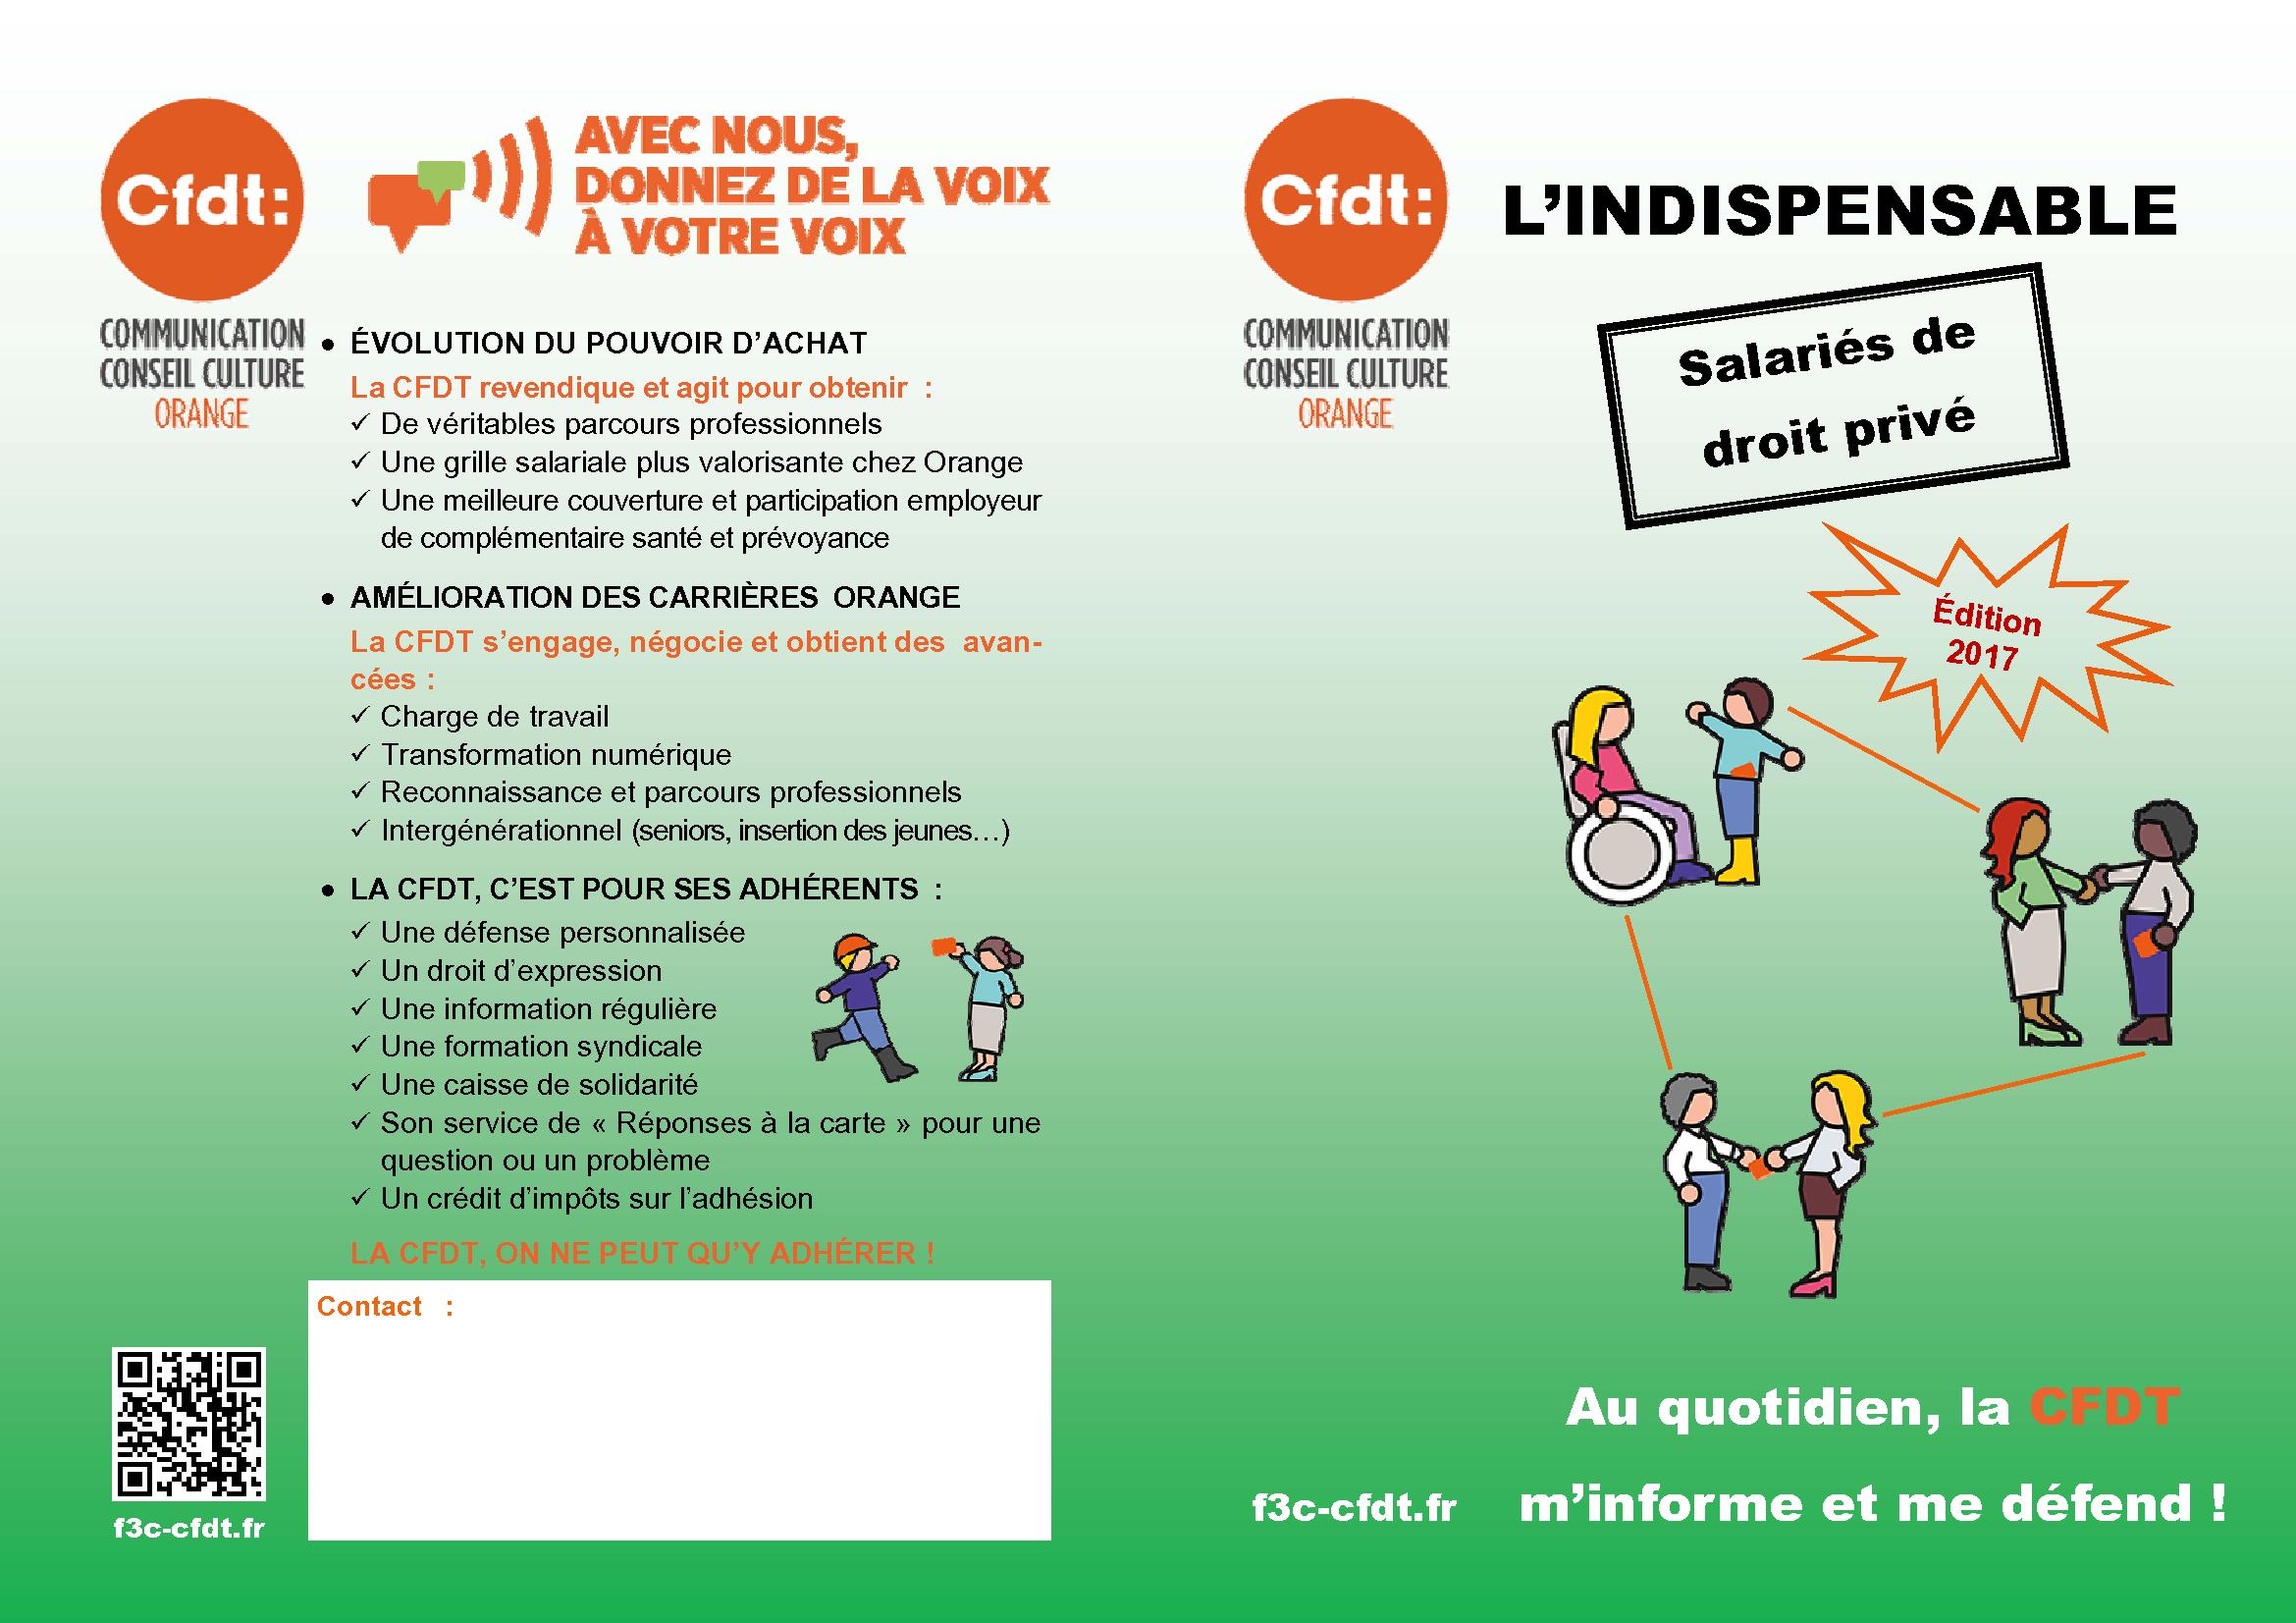 http://www.emailing.sce.cfdt-ftorange.fr/images/ScePublicCom/Livrets/20170603-Liaison-Orange_Indispensable-droit-prive-2017.pdf